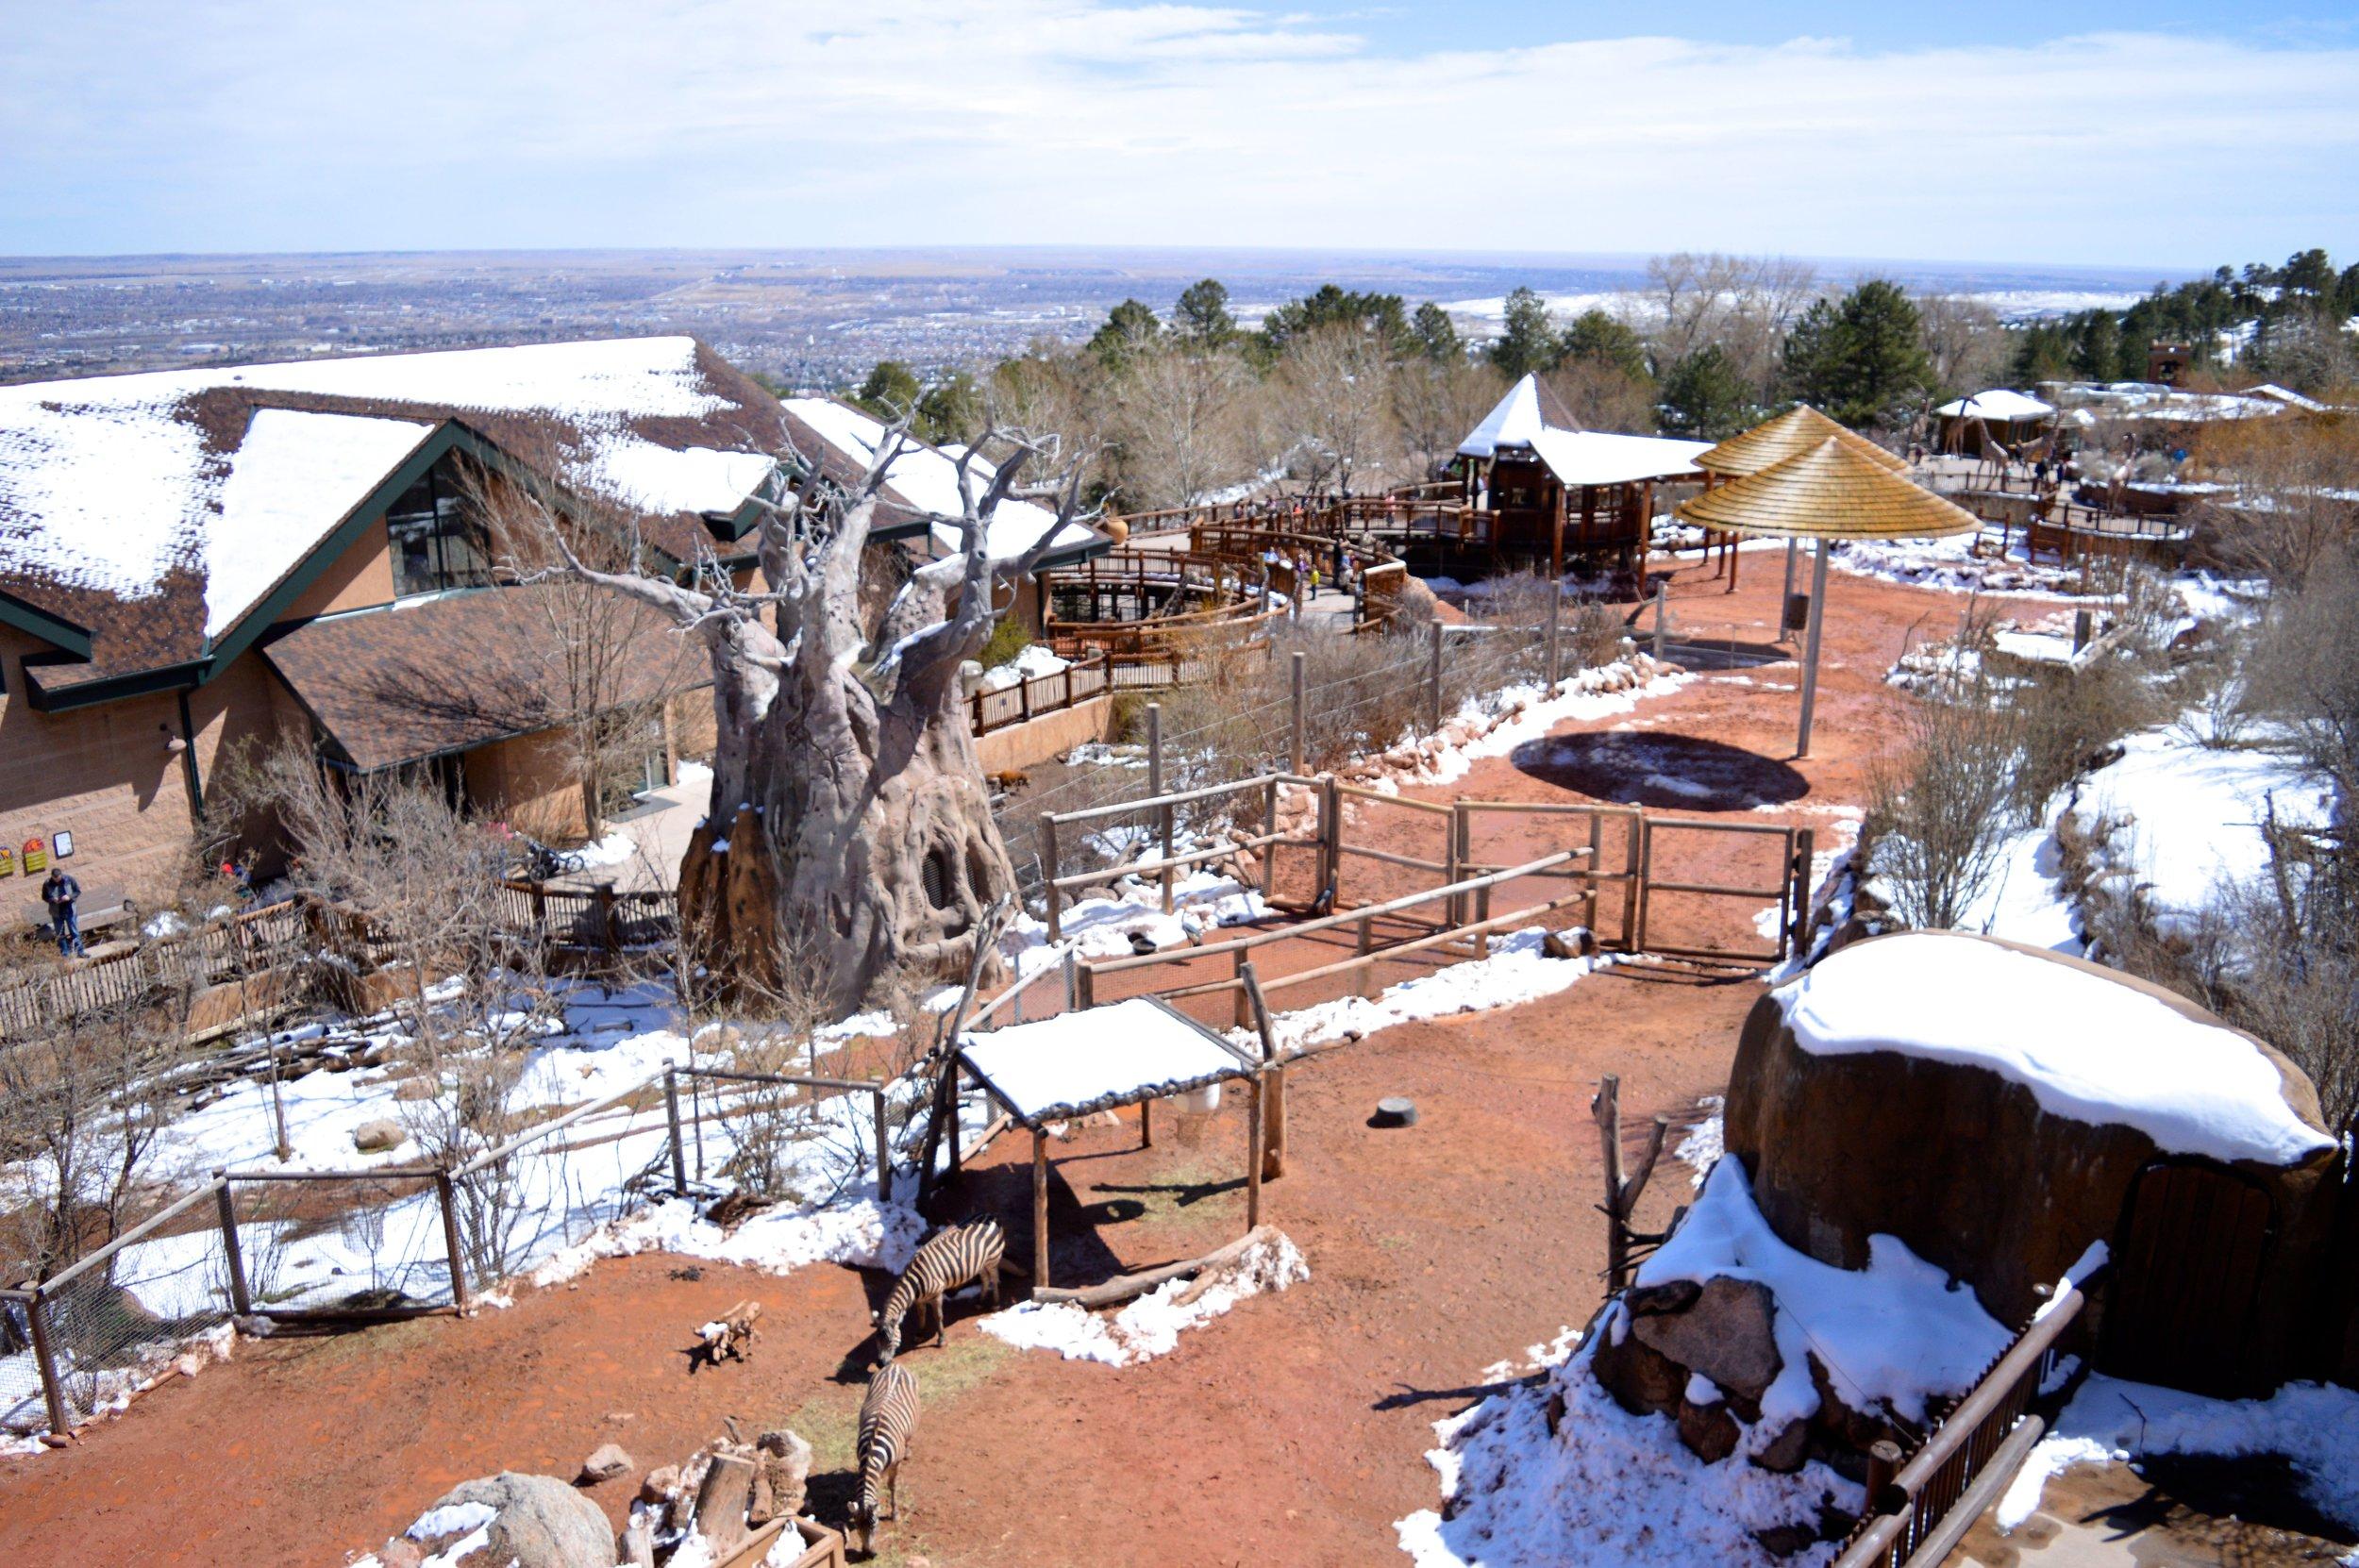 cheyenne-mountain-zoo-view.jpg